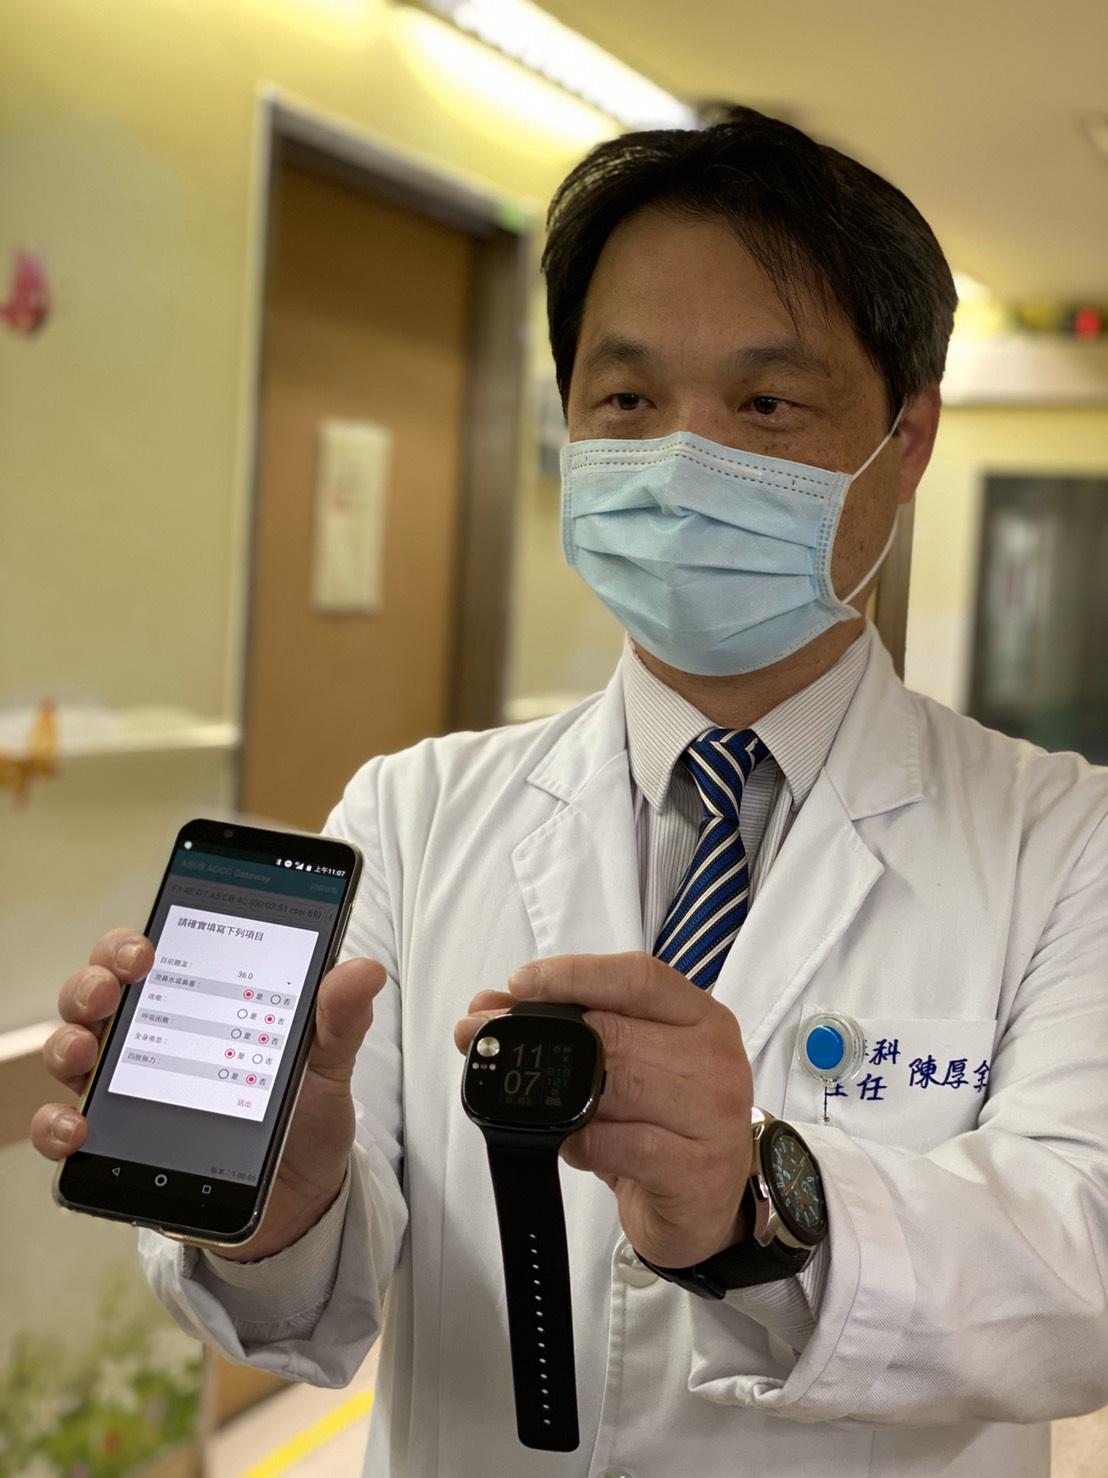 ASUS ZenFone Max Pro與ASUS VivoWatch的智慧防疫解決方案。